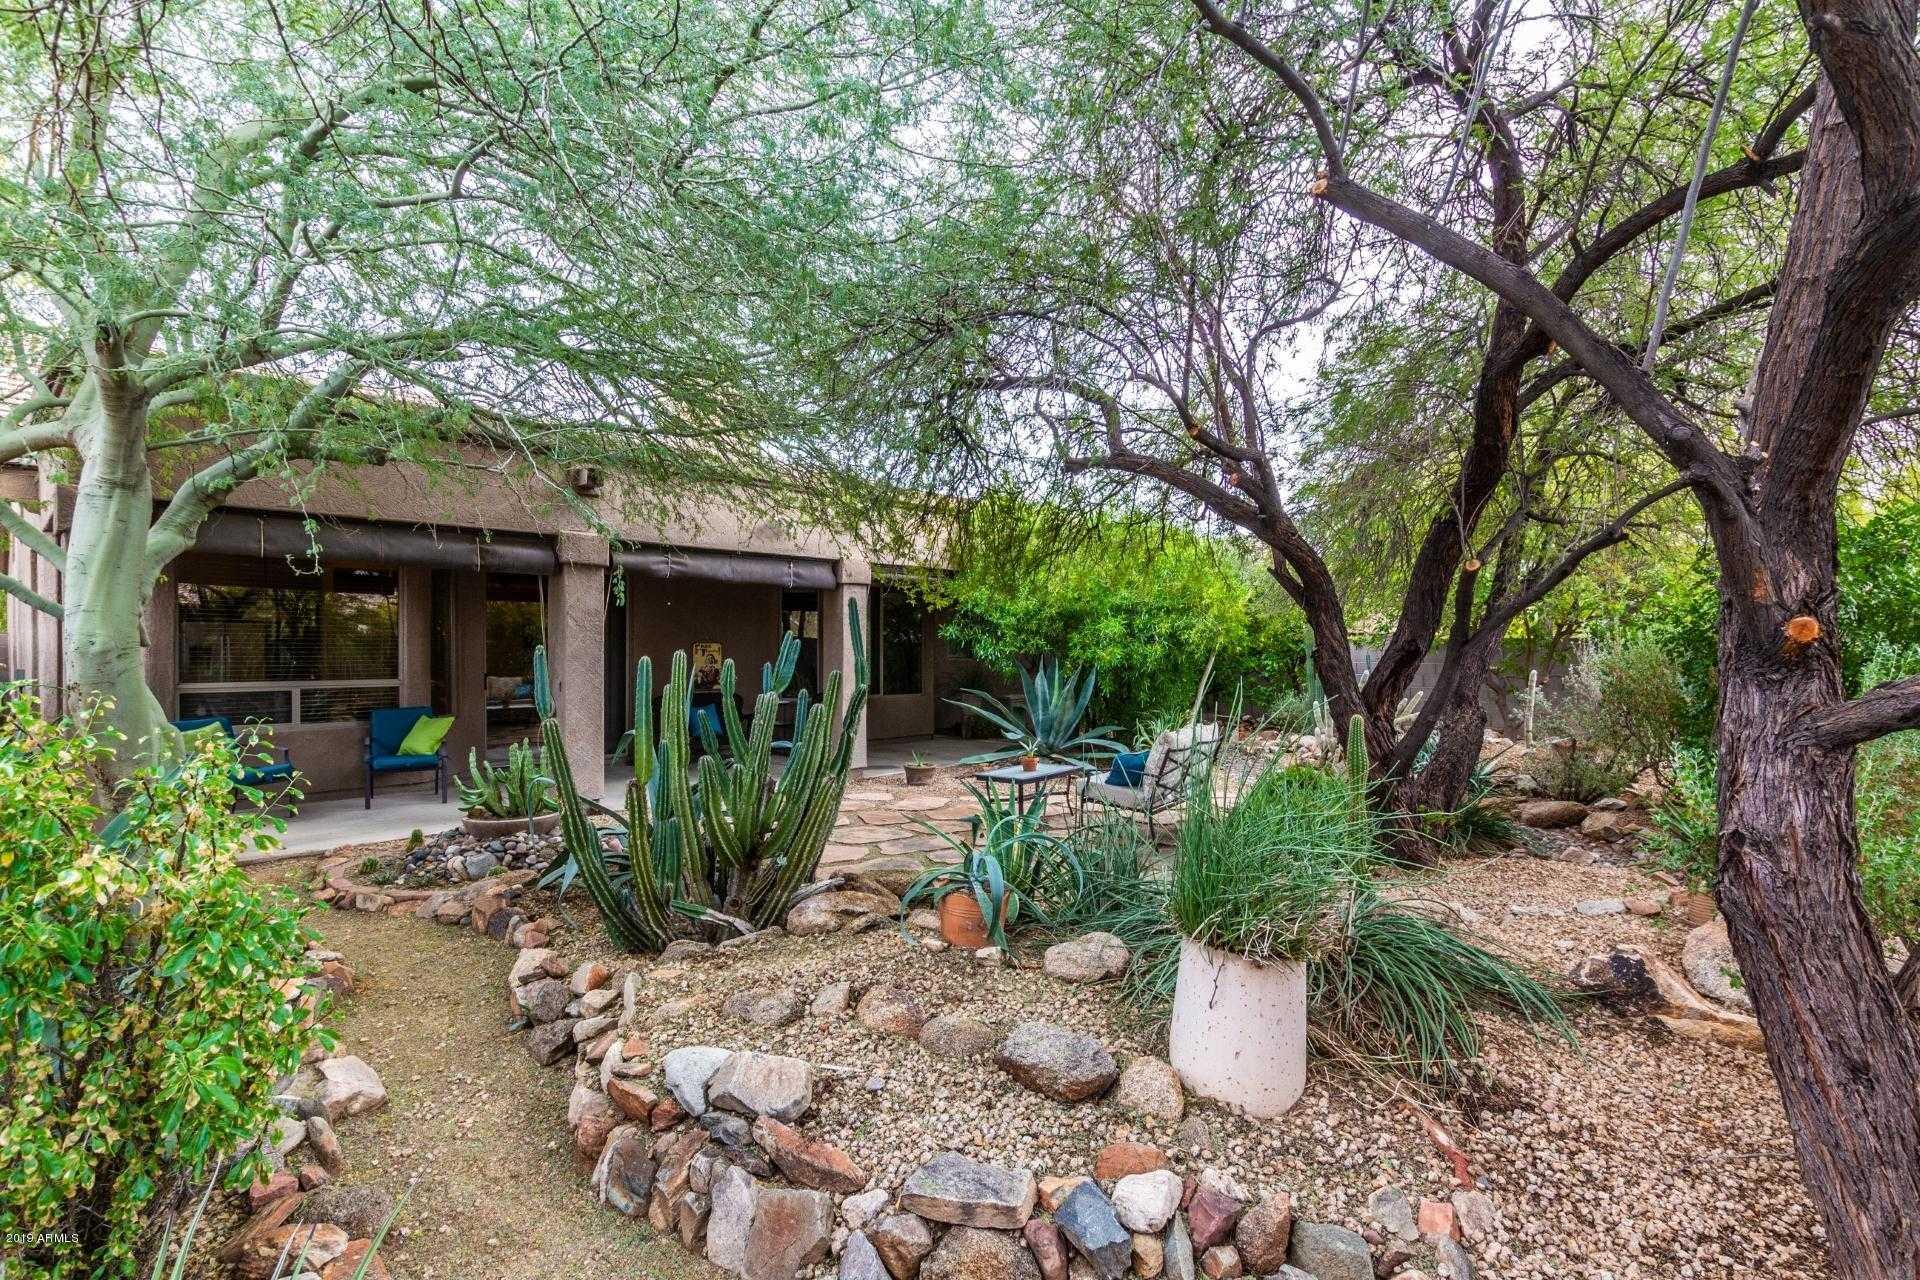 $495,000 - 4Br/2Ba - Home for Sale in Kierland, Scottsdale